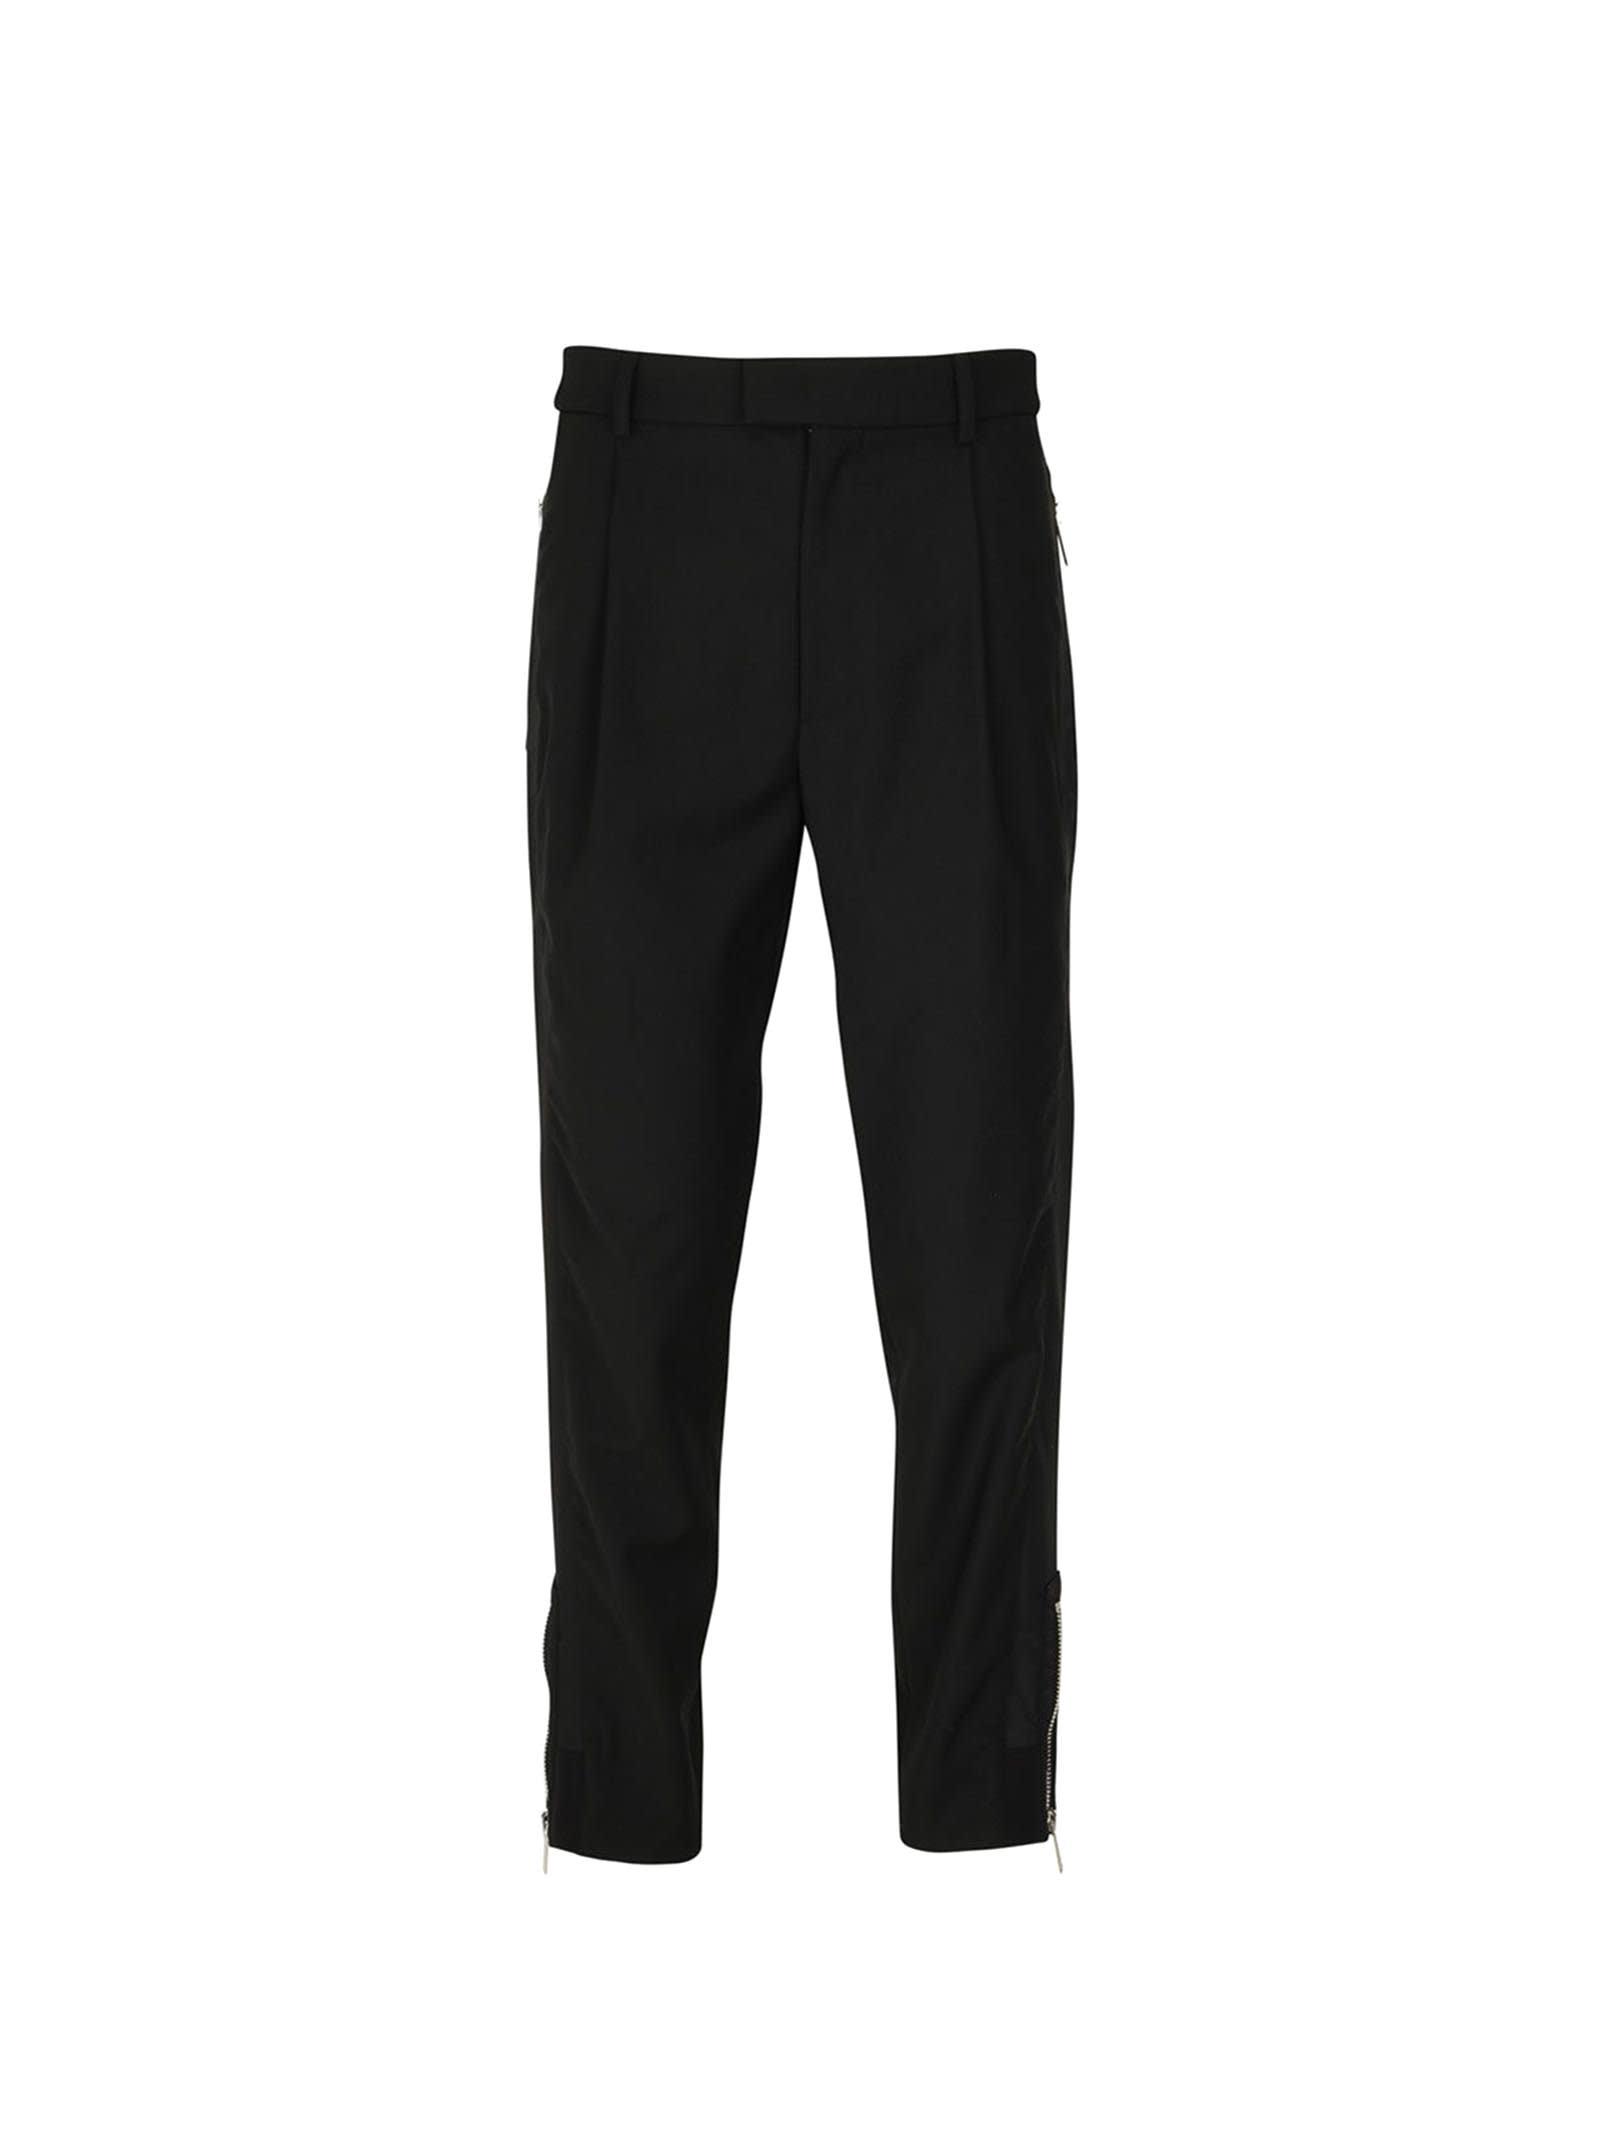 Les Hommes Les Hommes Tailored Trousers